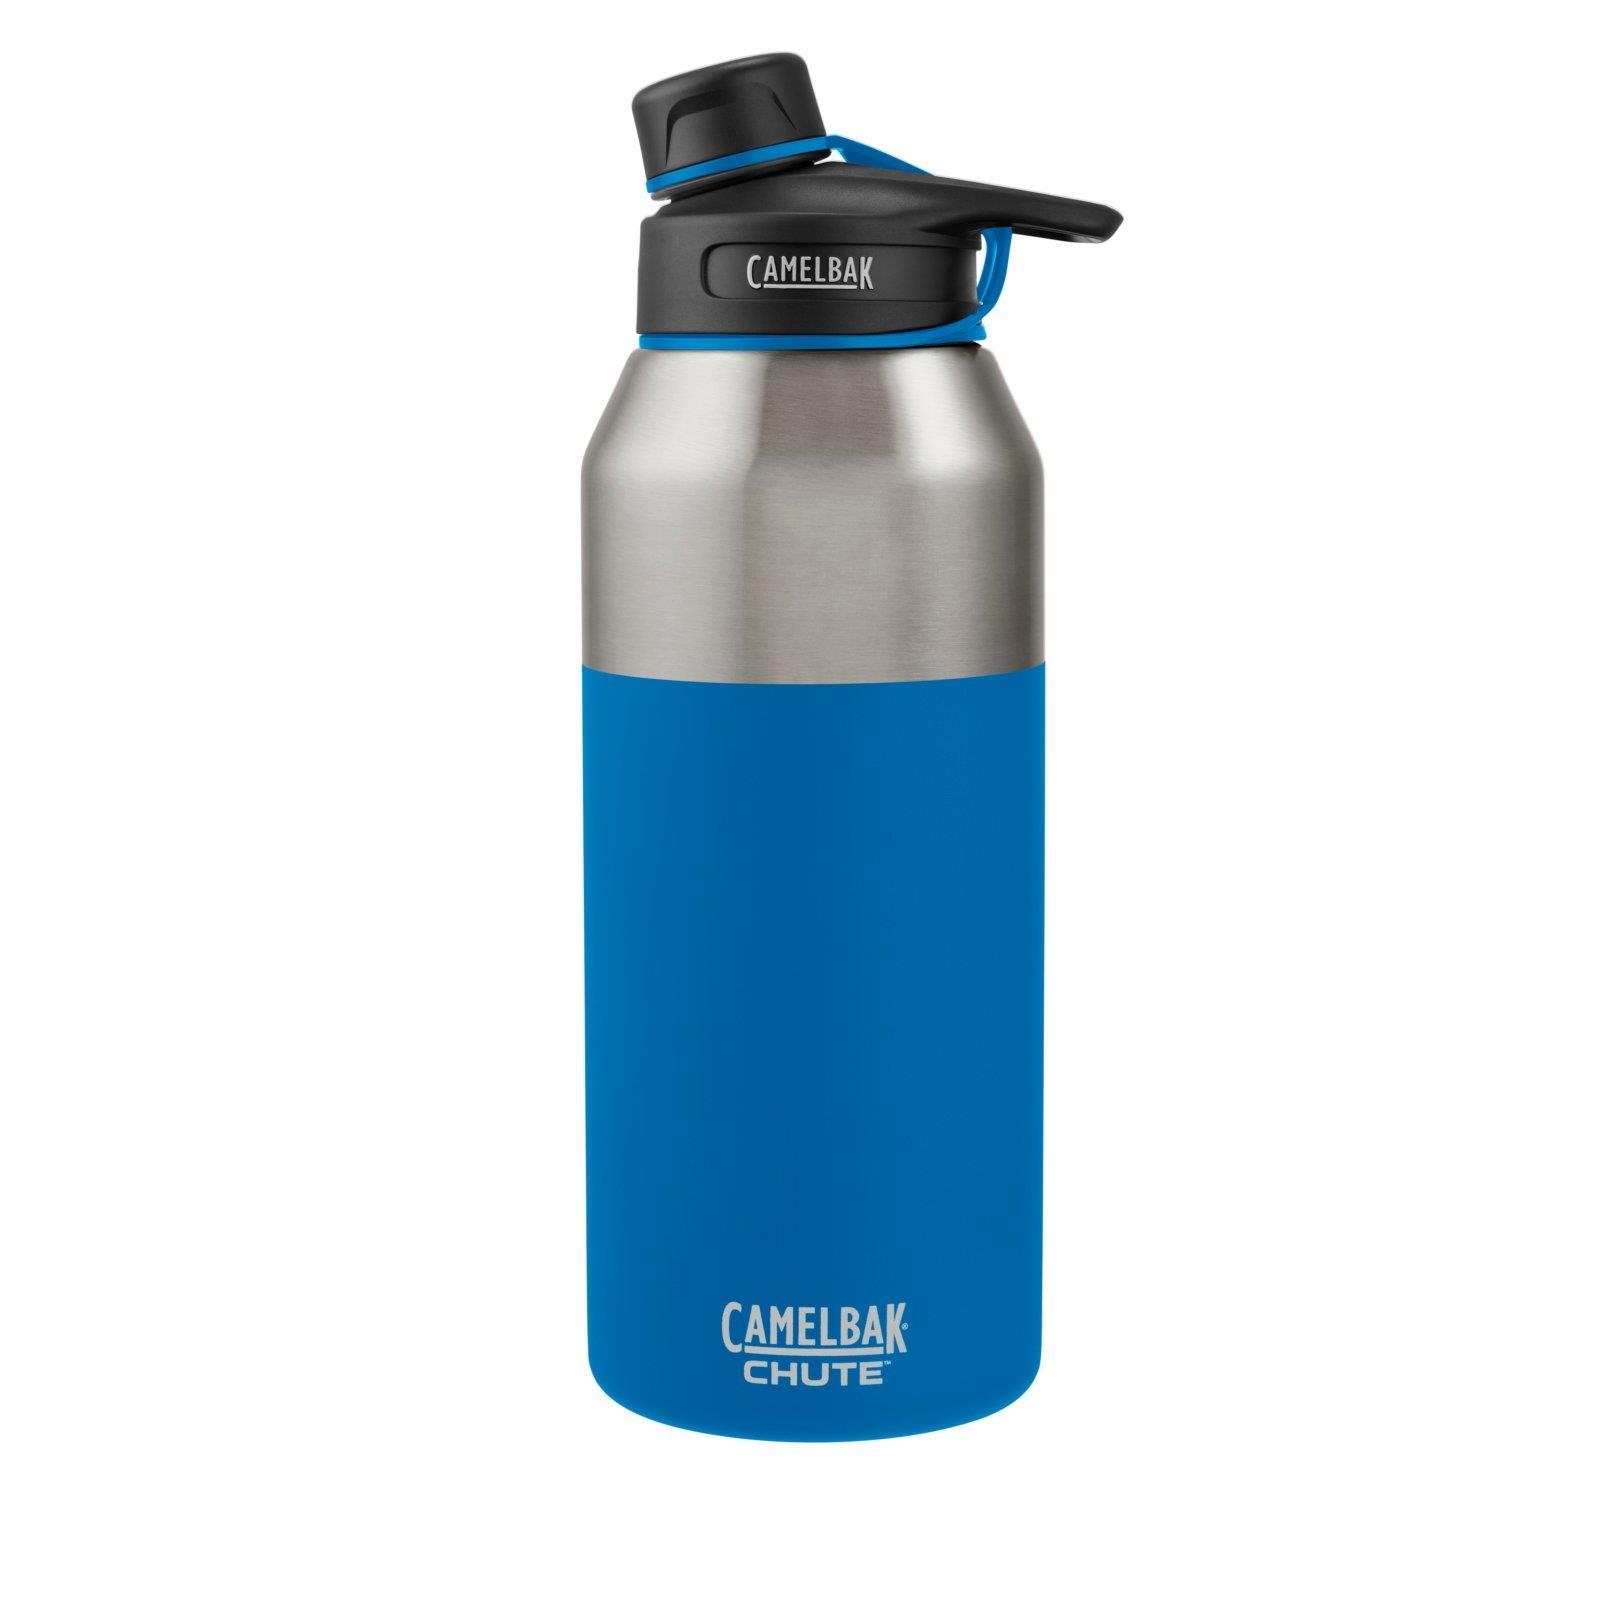 Camelbak-Trink-Isolier-Flasche-Chute-Vacuum-Thermo-Becher-Kanne-Outdoor Indexbild 25